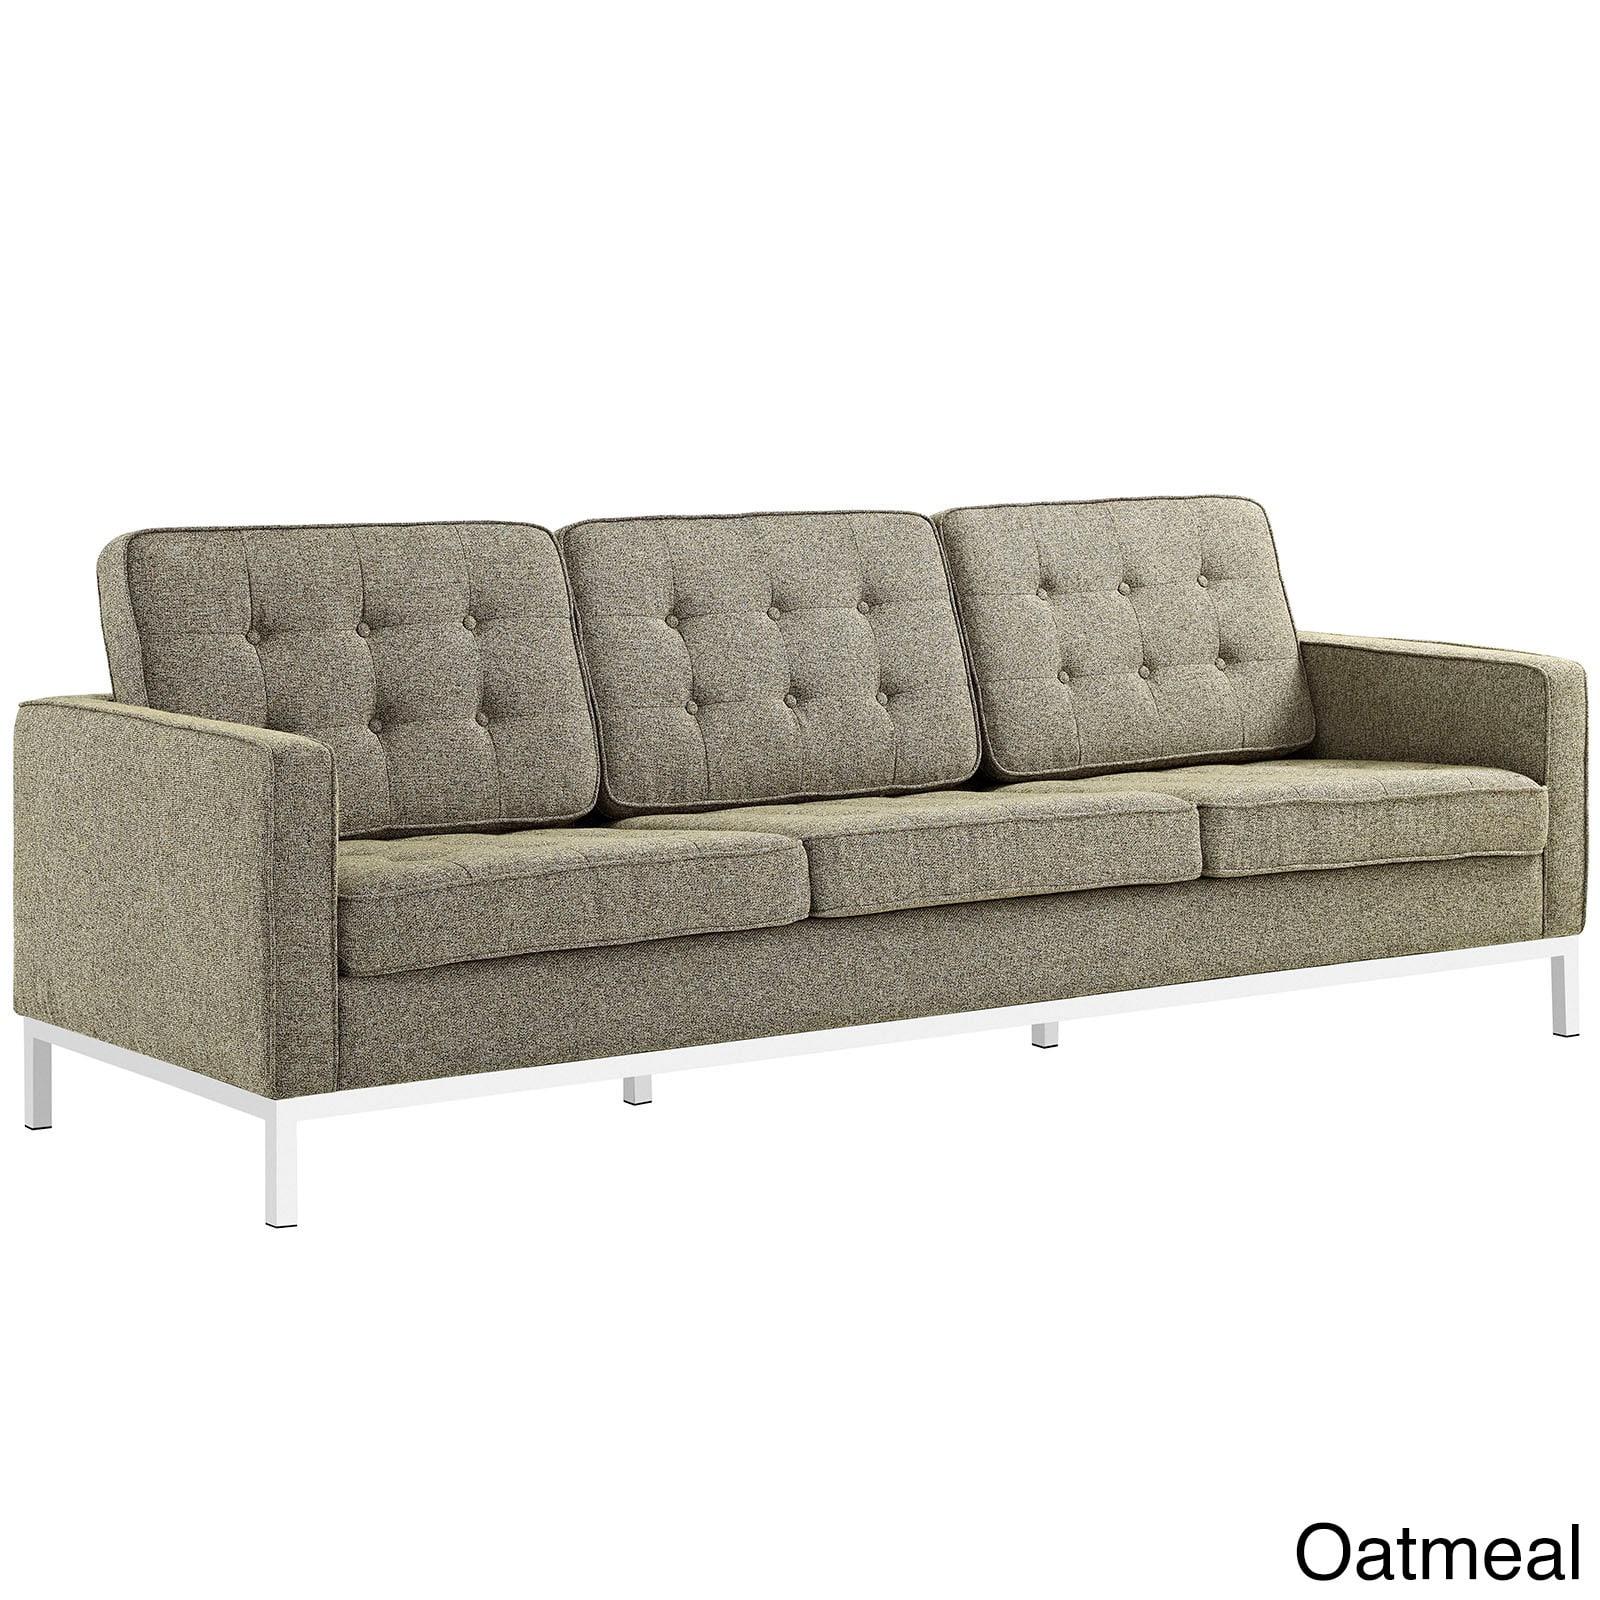 Shop Loft Fabric Upholstered Sofa and Armchair Living Room Set ...